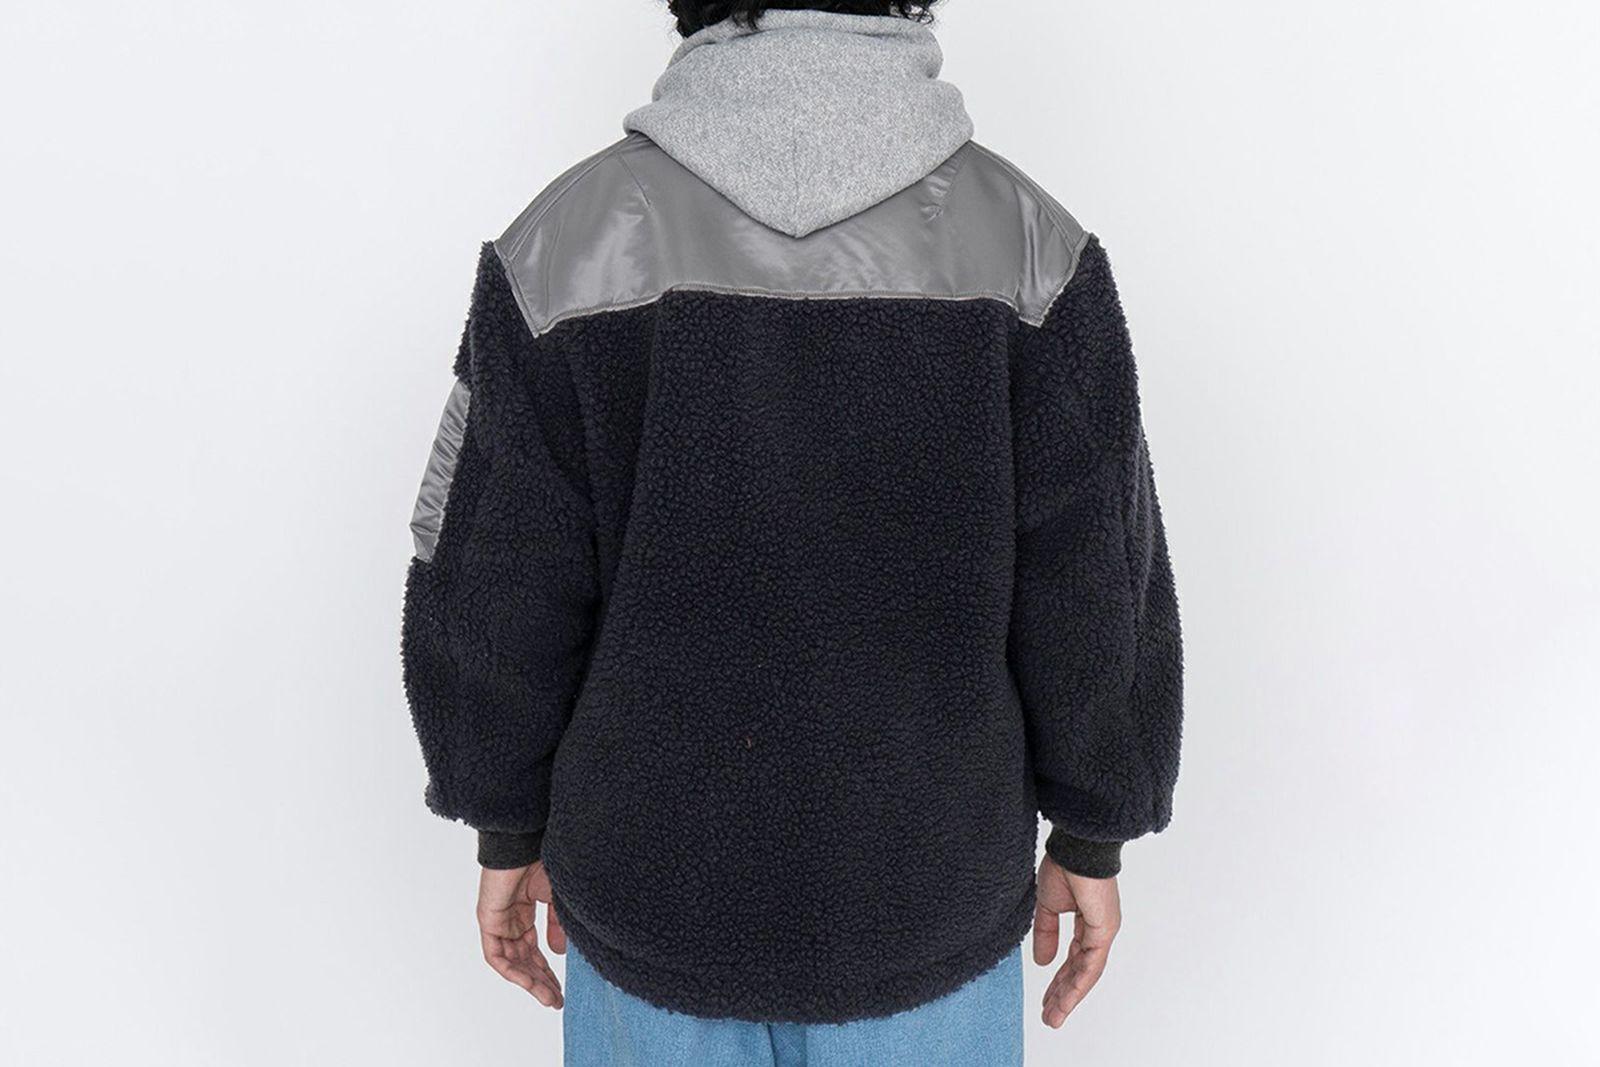 the north face purple label denali fleece jacket gore tex infinium wool boa release date info buy online wiki store america europe retailer